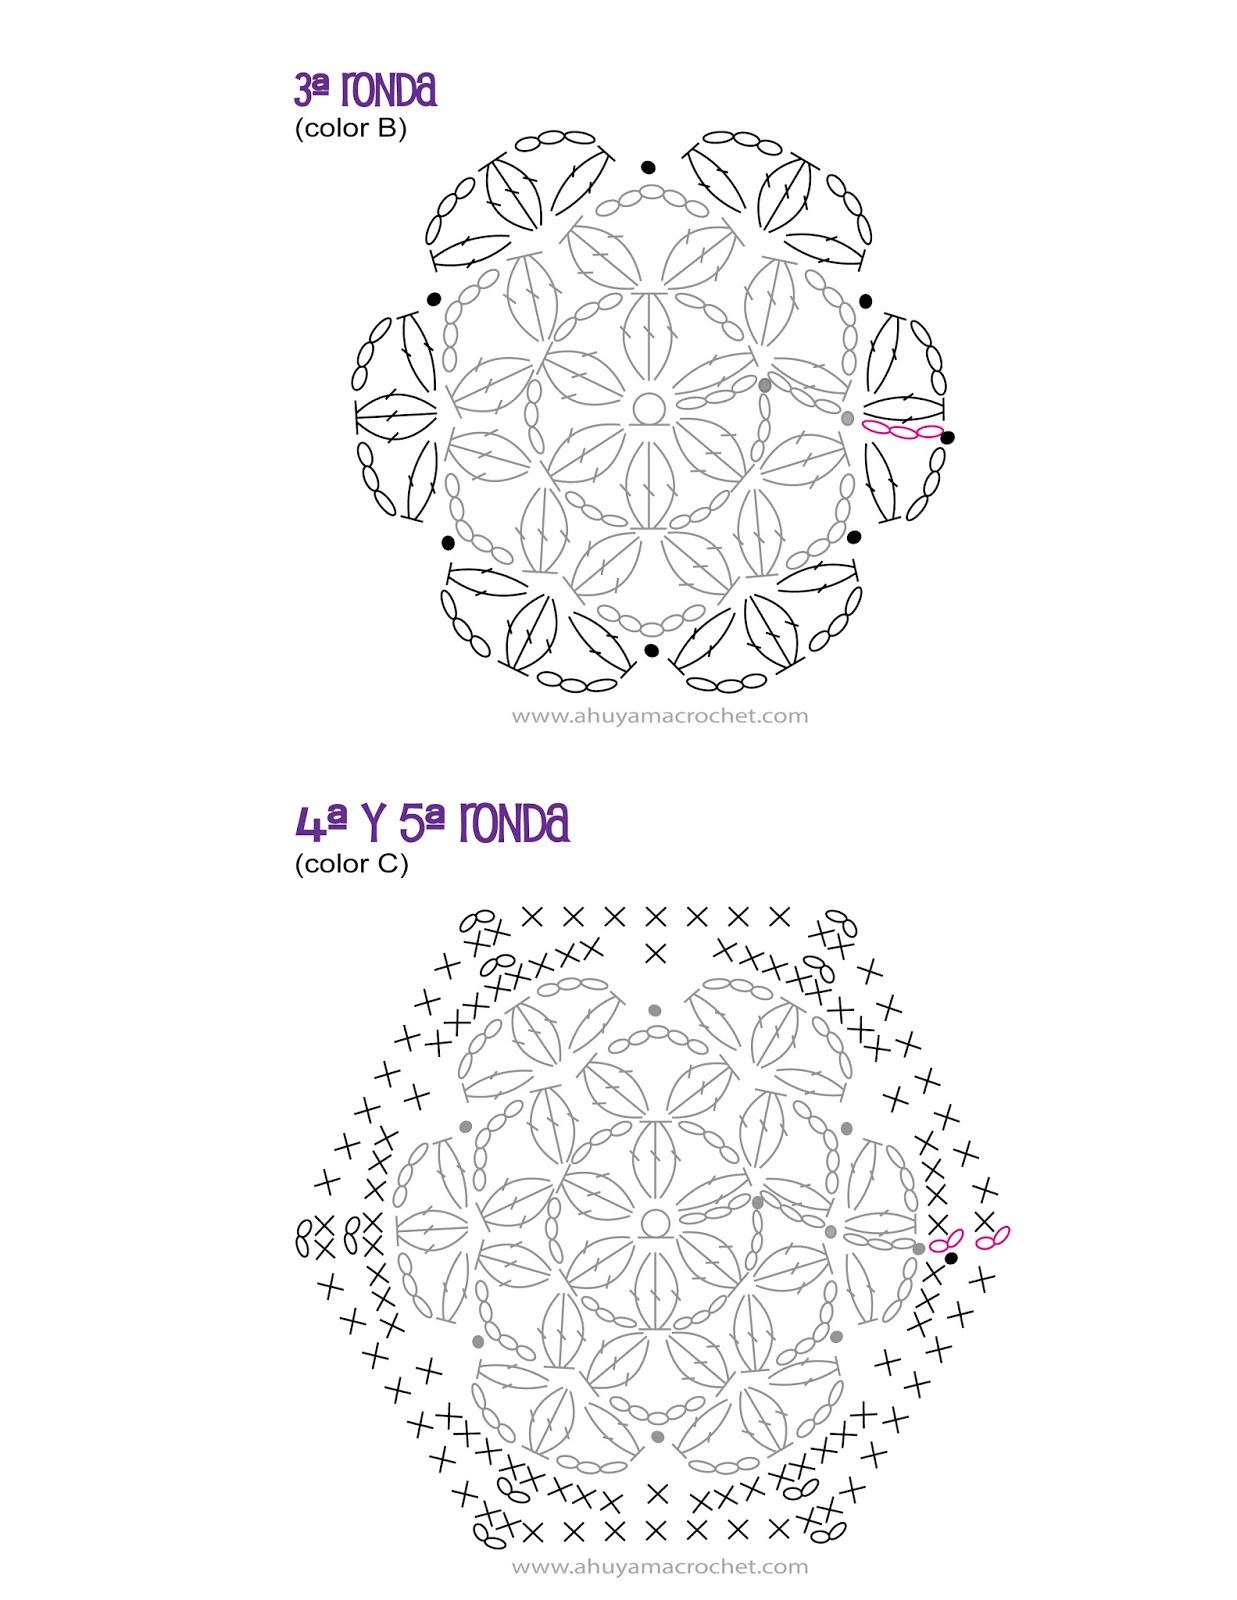 patrón colcha de hexágonos a crochet - ahuyama crochet